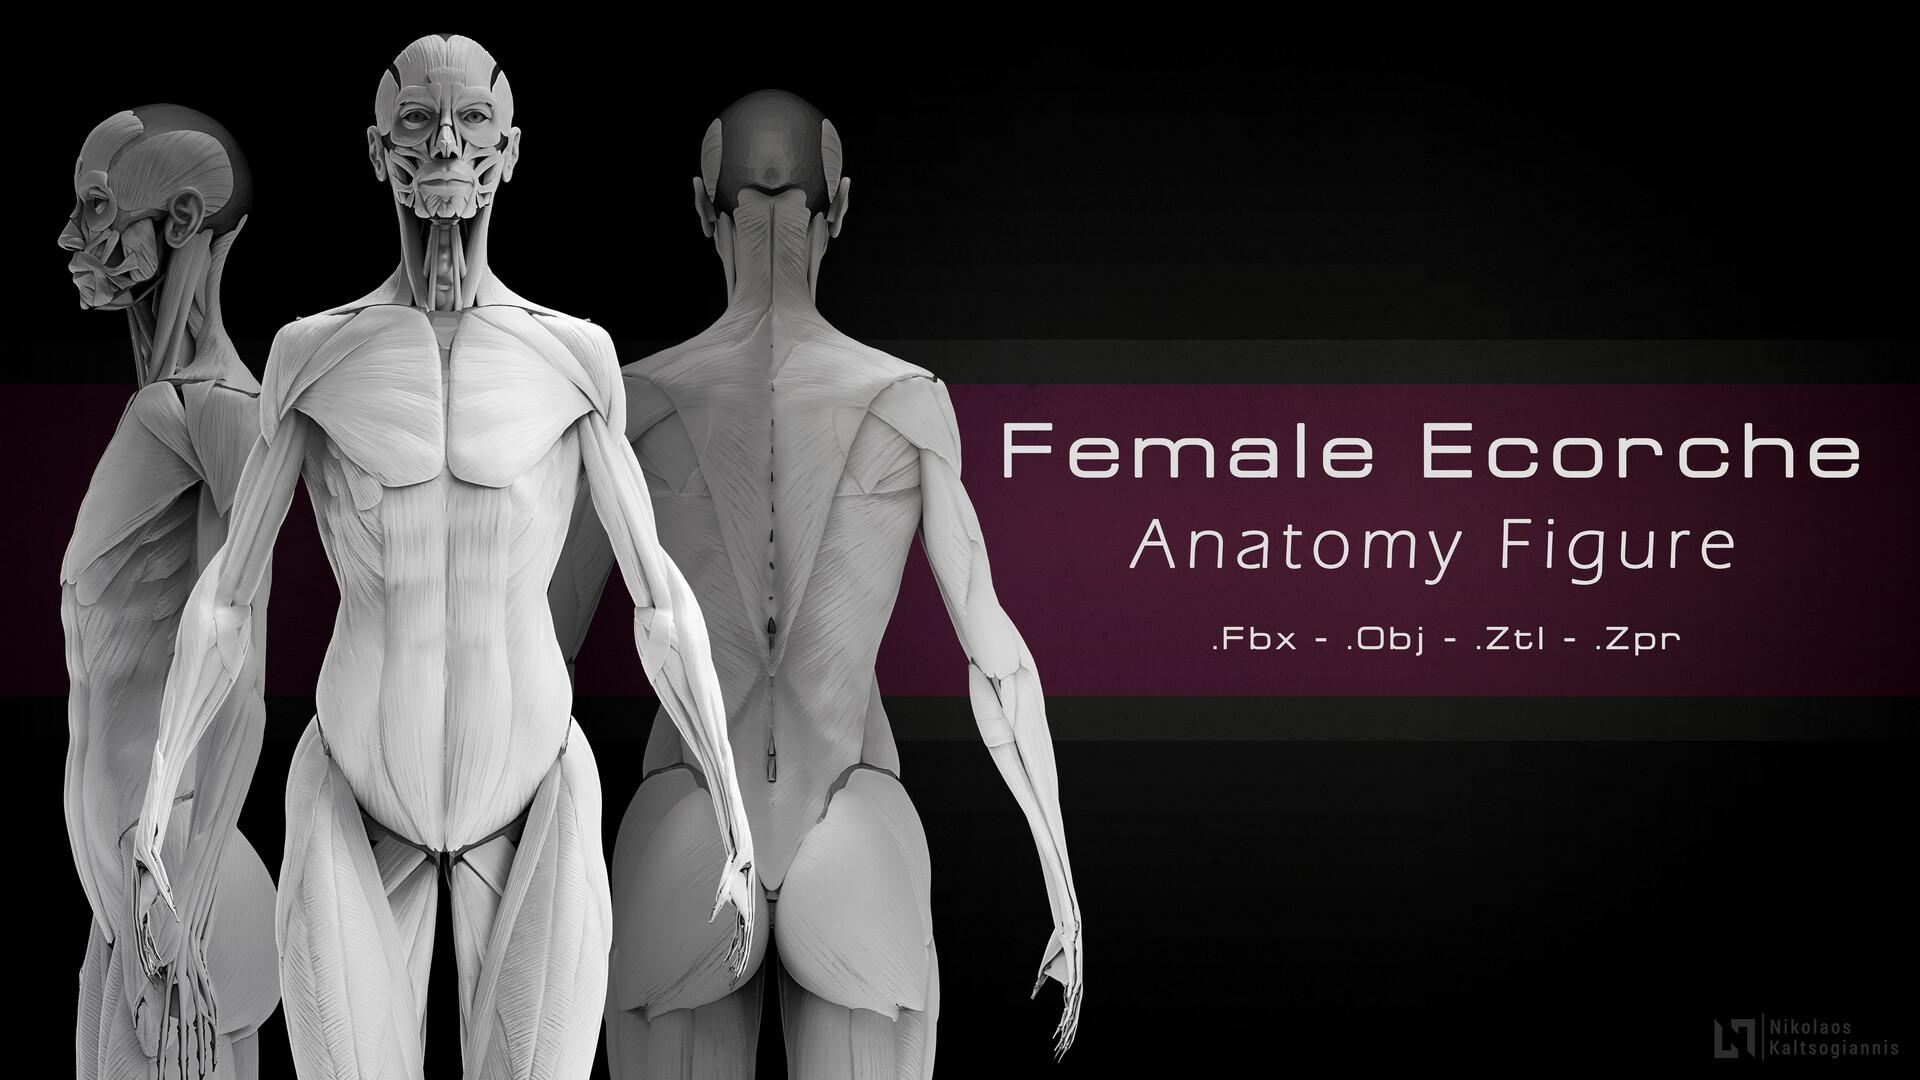 Nikolaos kaltsogiannis female anatomy echorche shop thumbnail 01